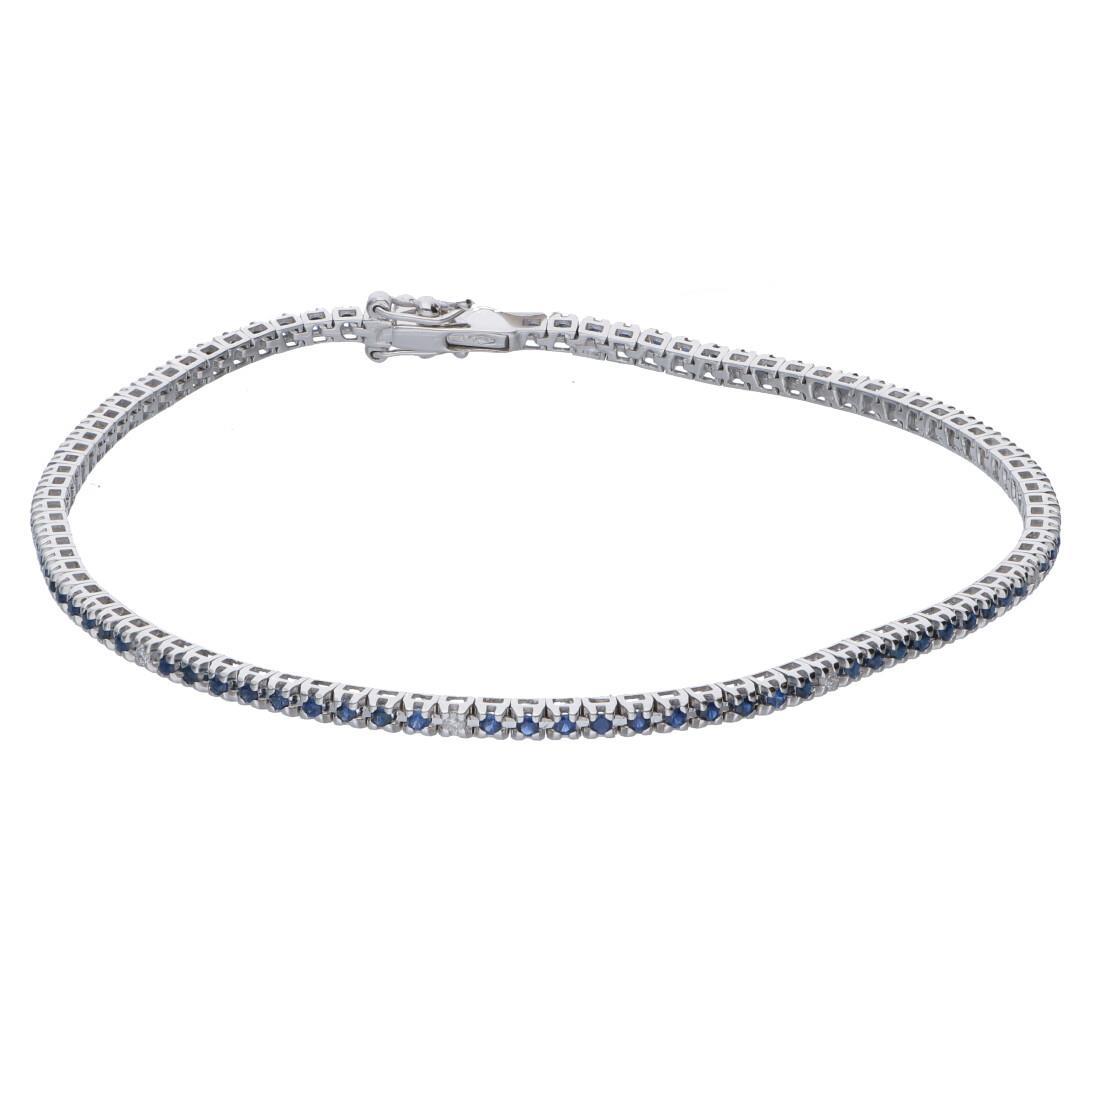 Bracciale tennis con diamanti bianchi e zaffiri - ALFIERI & ST. JOHN